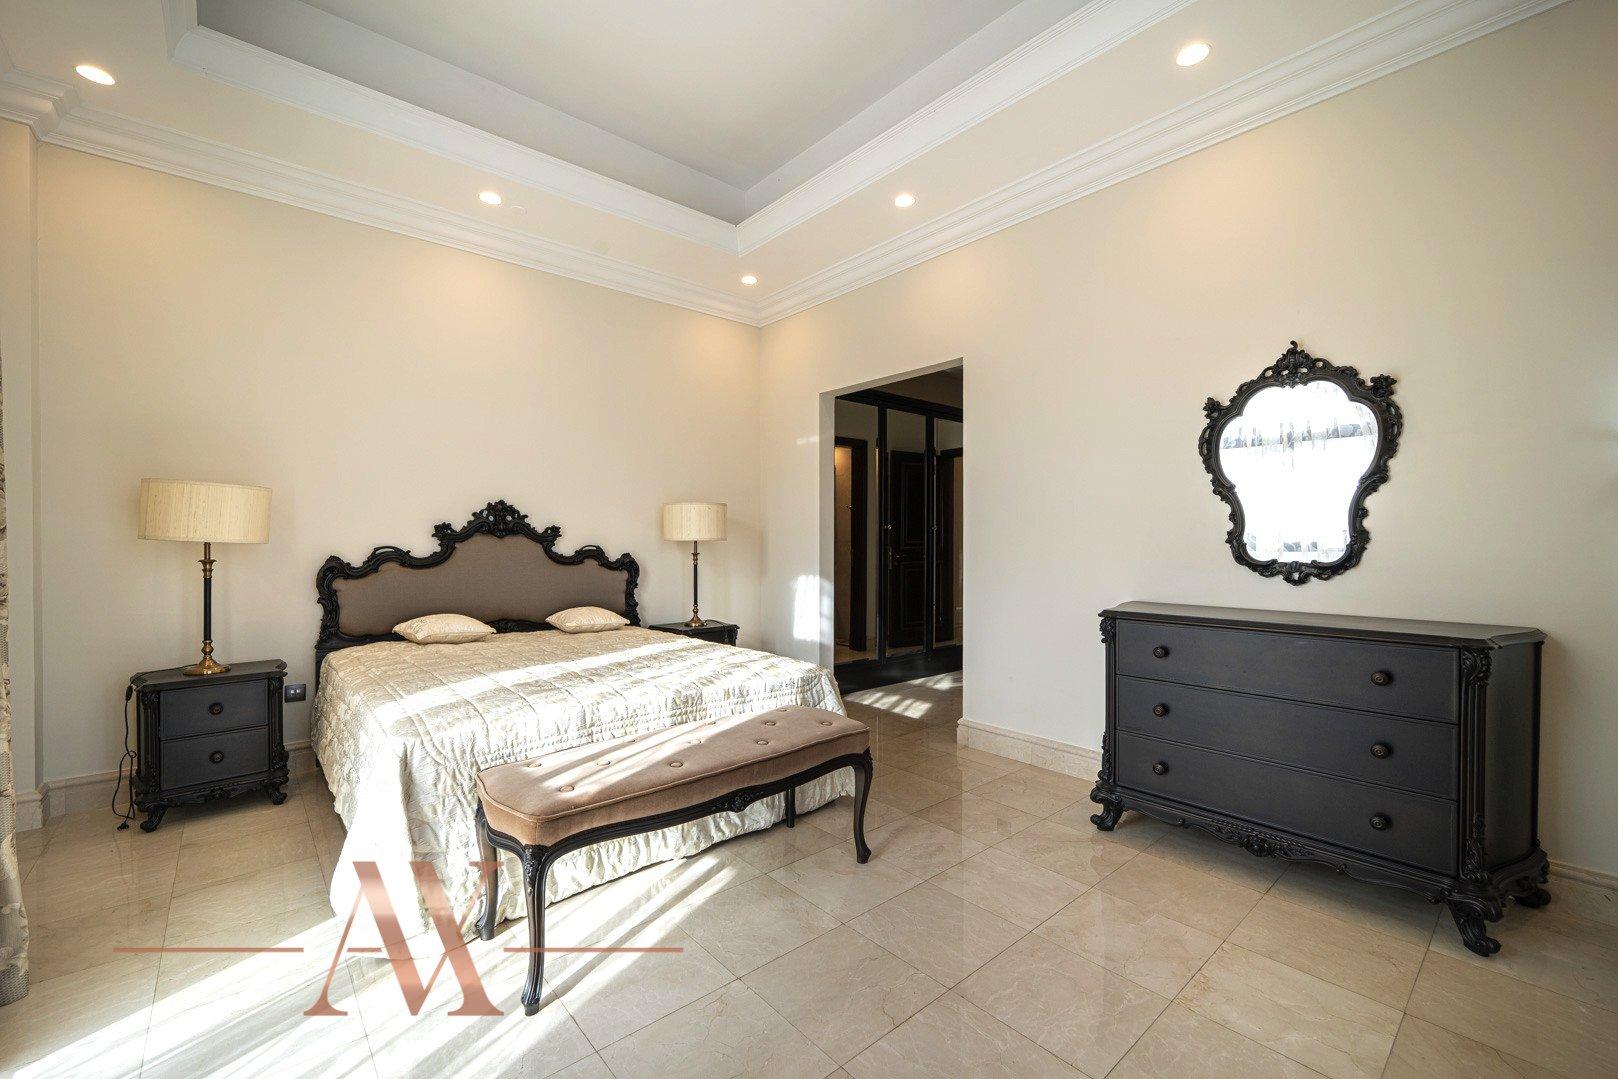 Penthouse for sale in Dubai, UAE, 5 bedrooms, 1057 m2, No. 23747 – photo 7